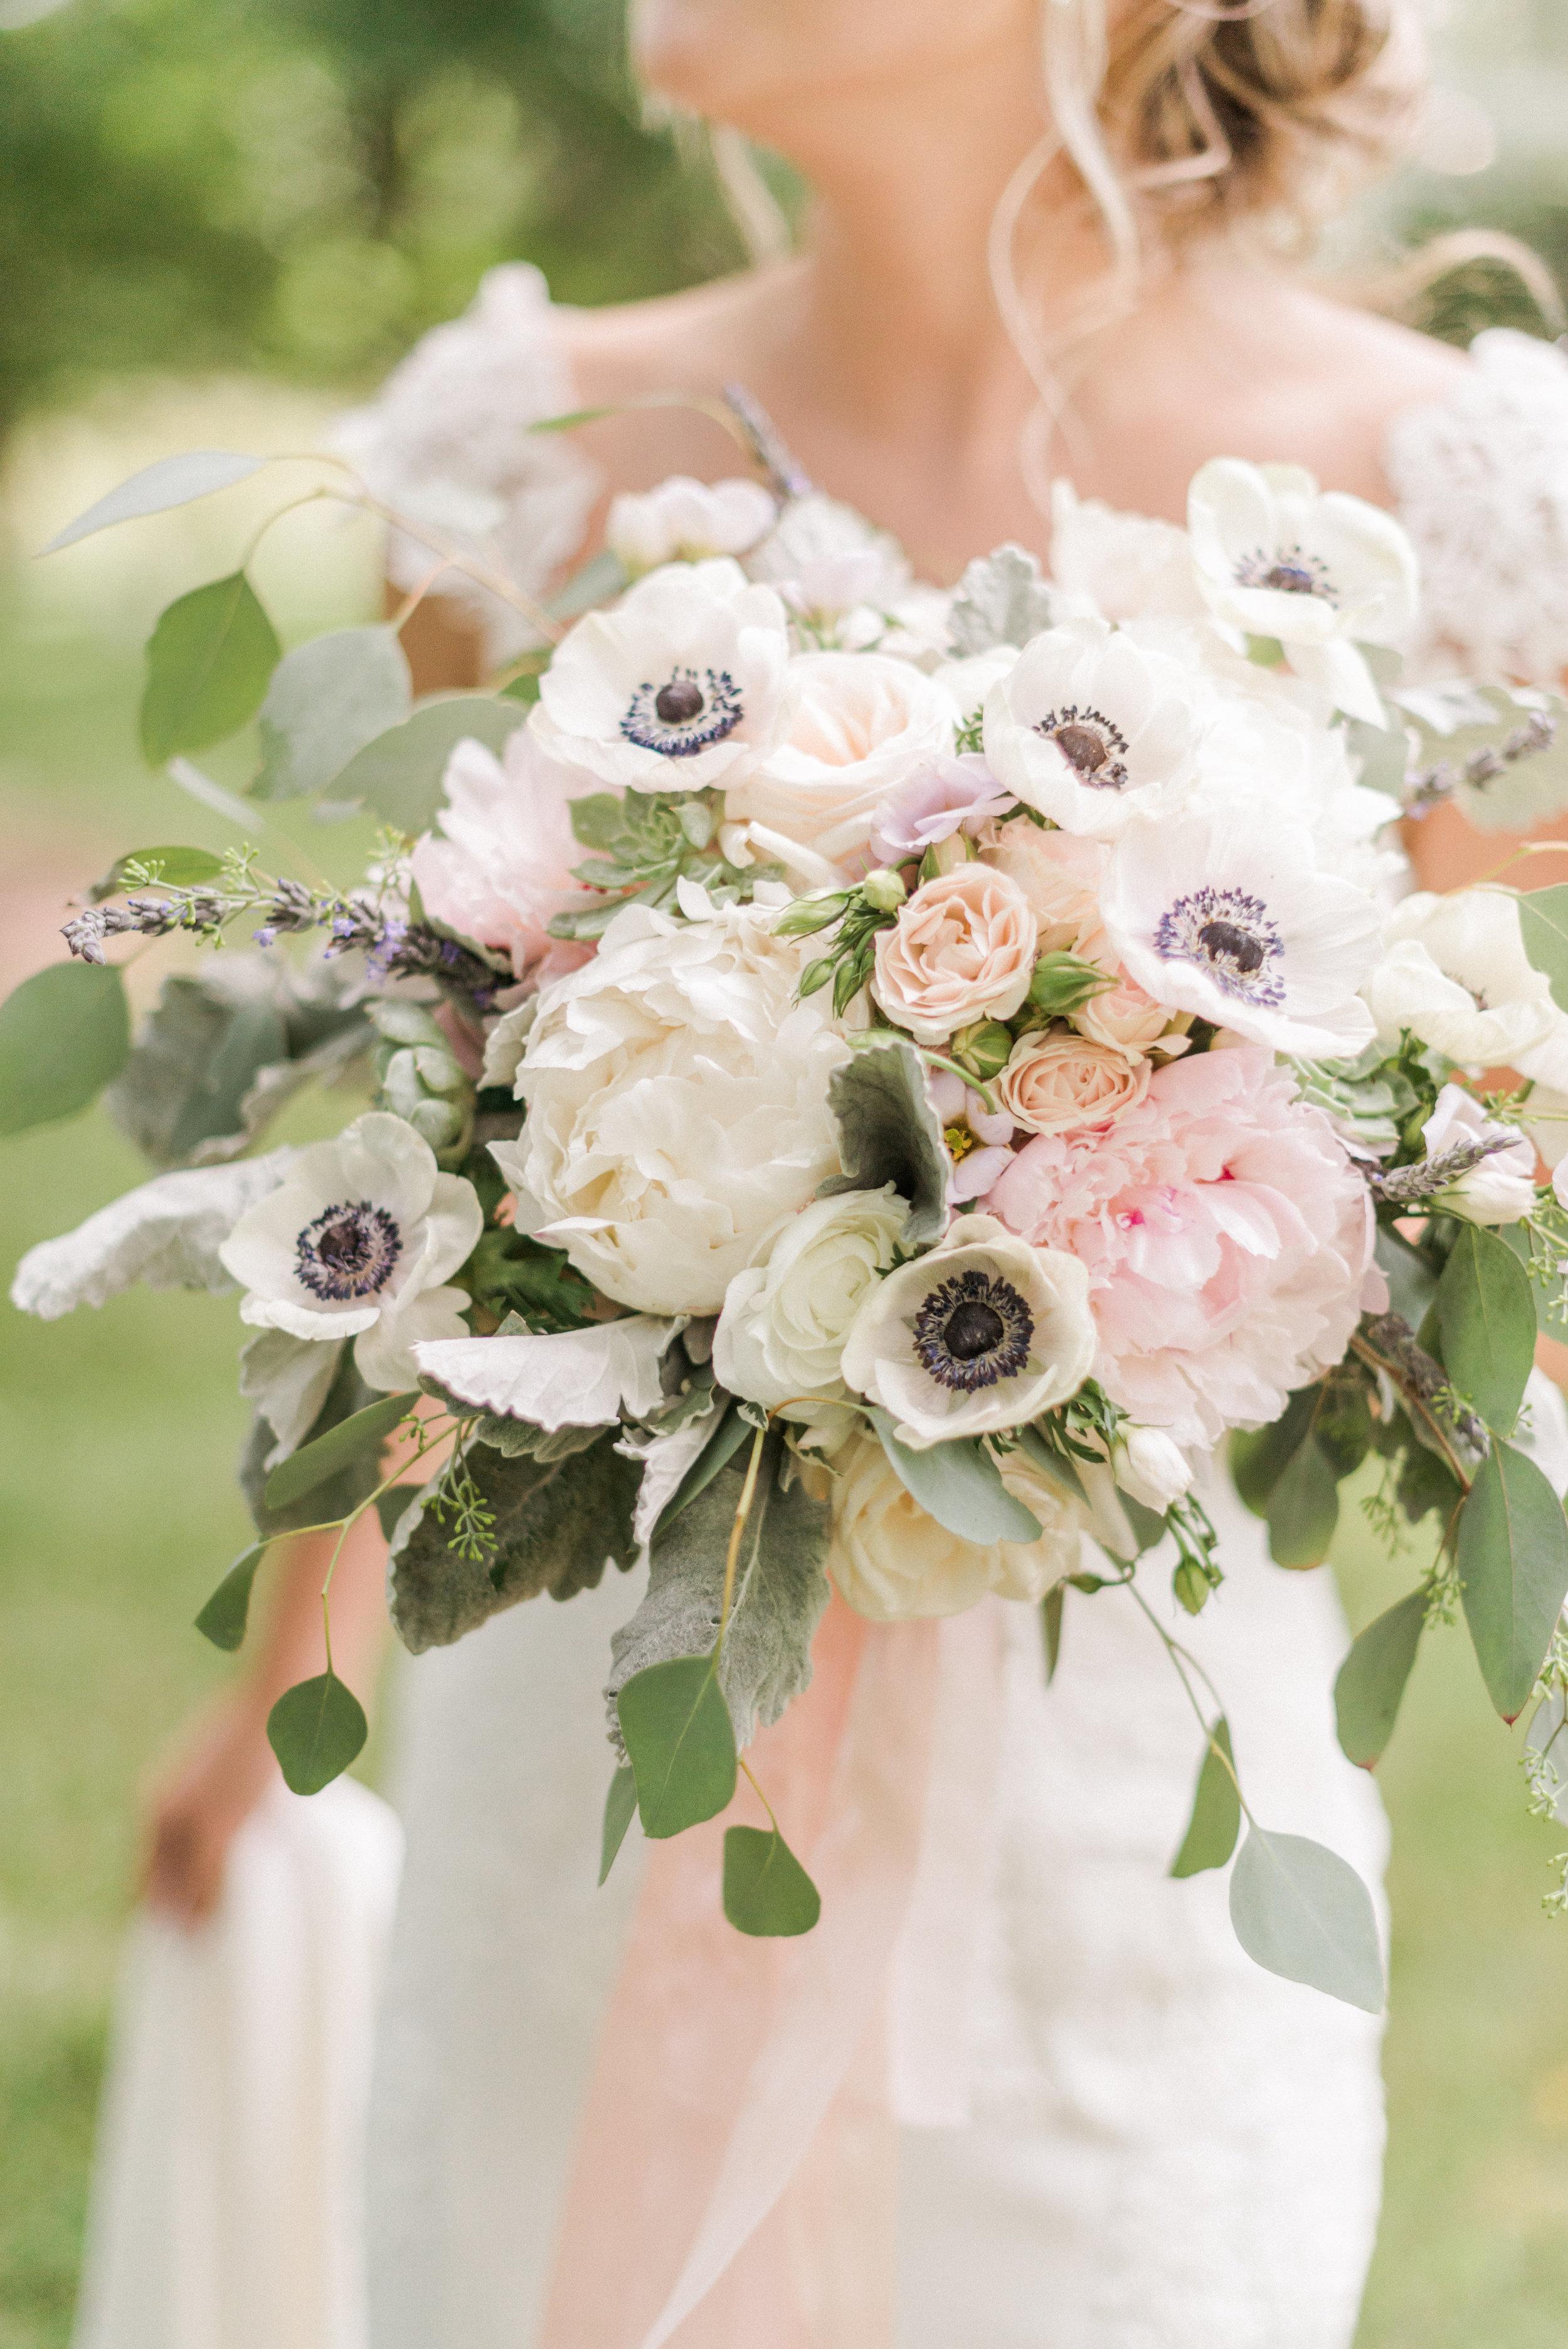 Courtney Inghram Virginia Wedding Florist Big Spring Farm Lexington, Virginia